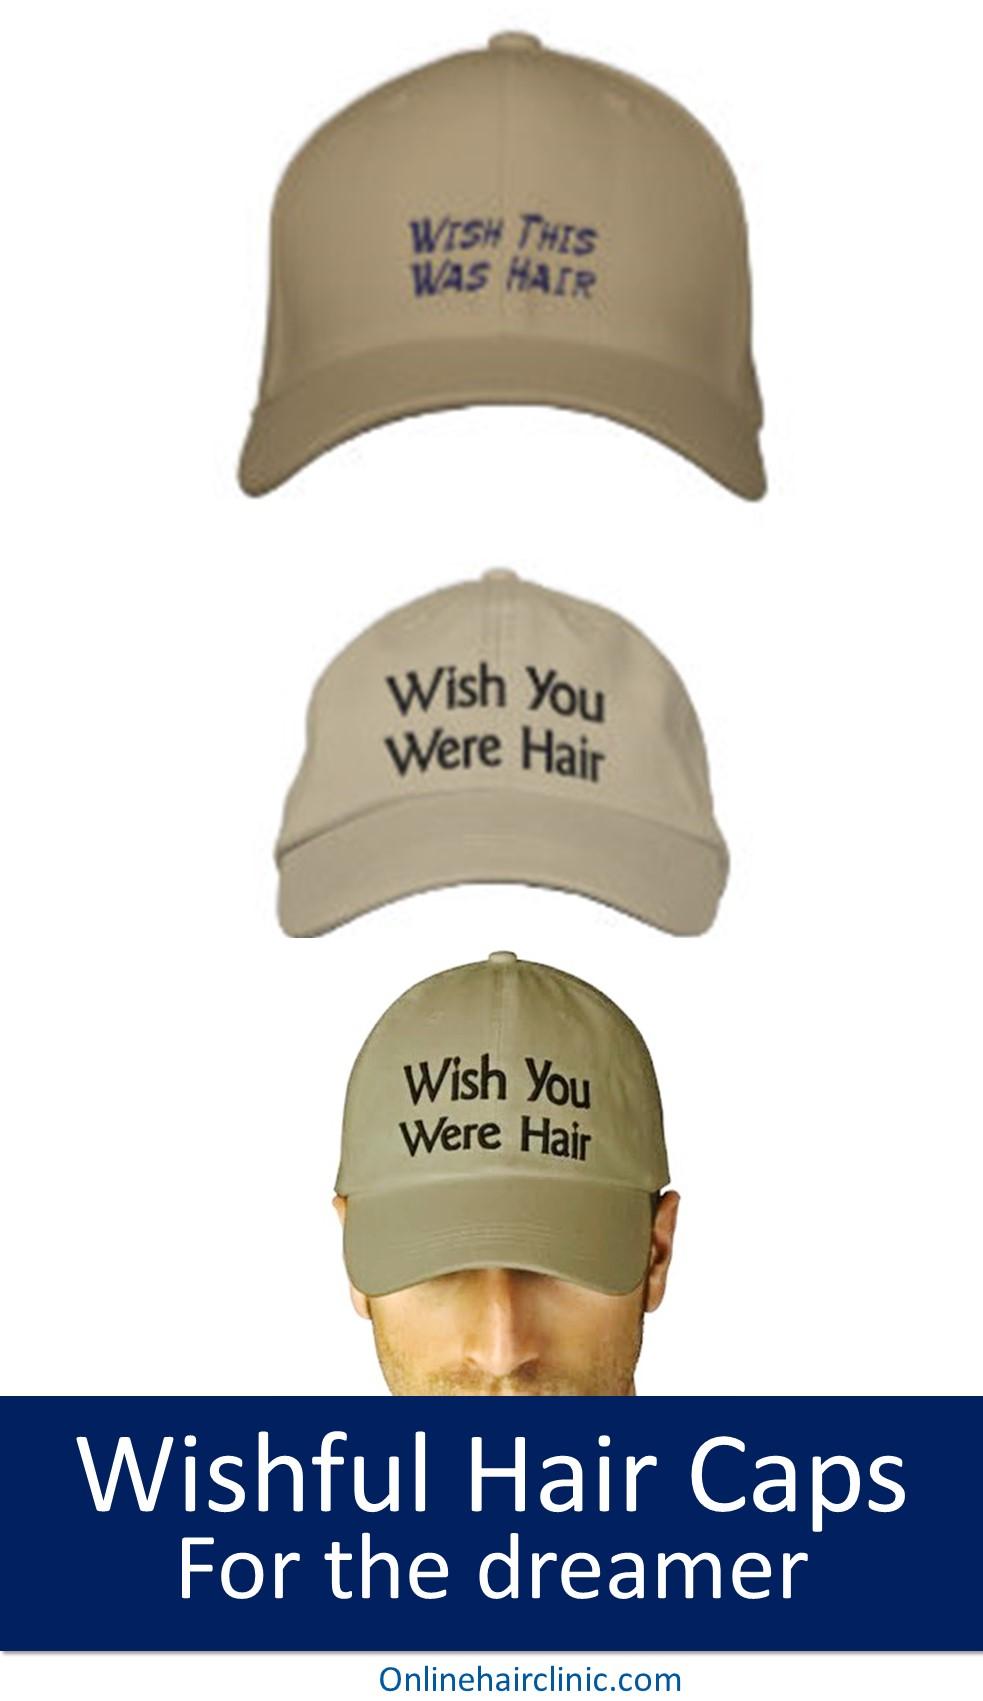 wish you were hair